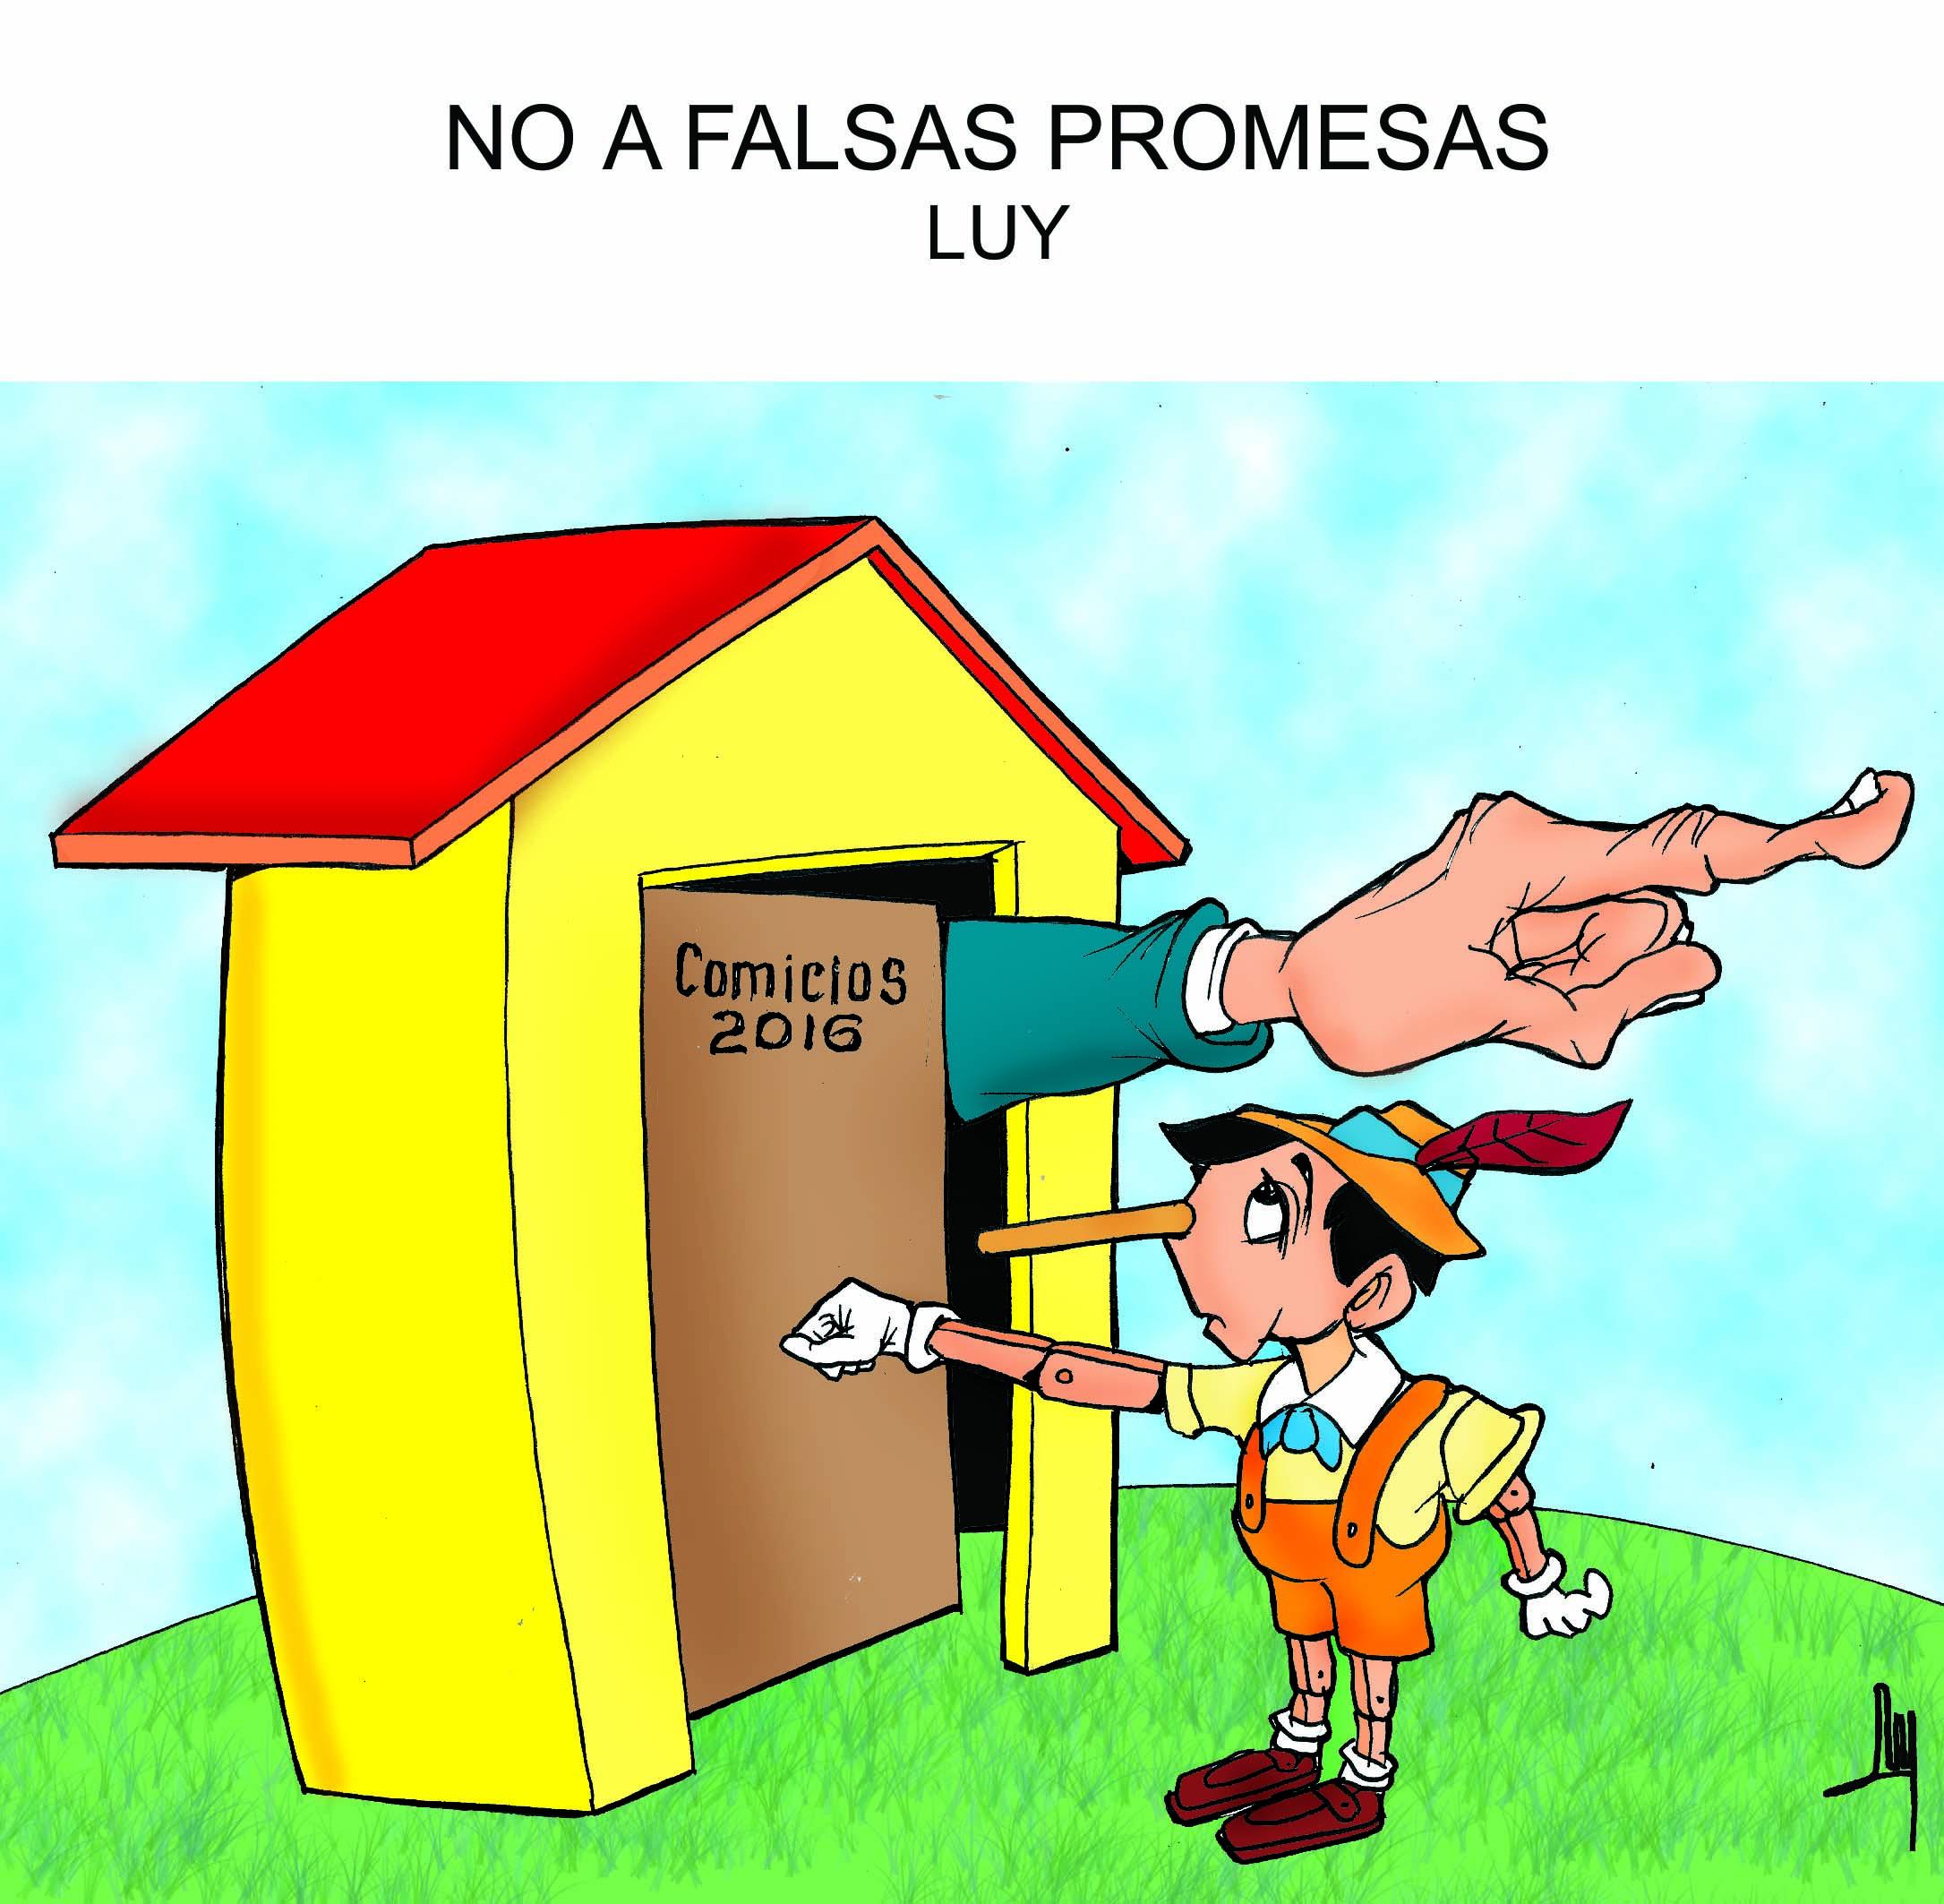 falsas-promesas